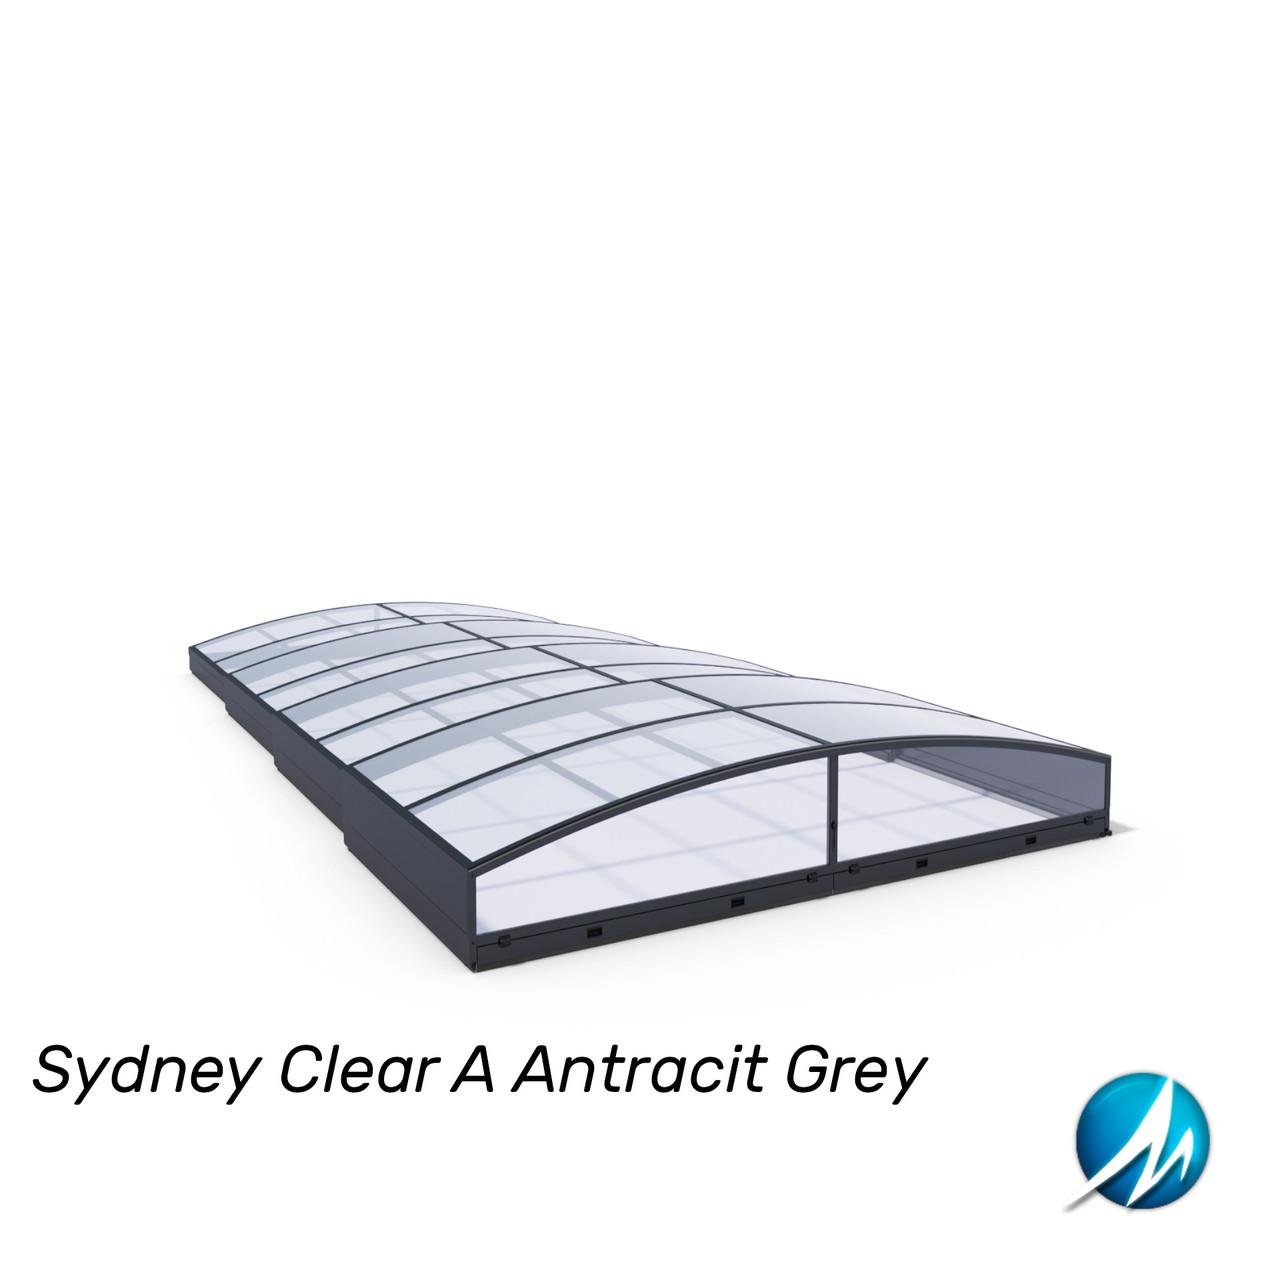 Павільйон для басейну Sydney Clear A 3,86х6,46х0,45м - Antracit Grey